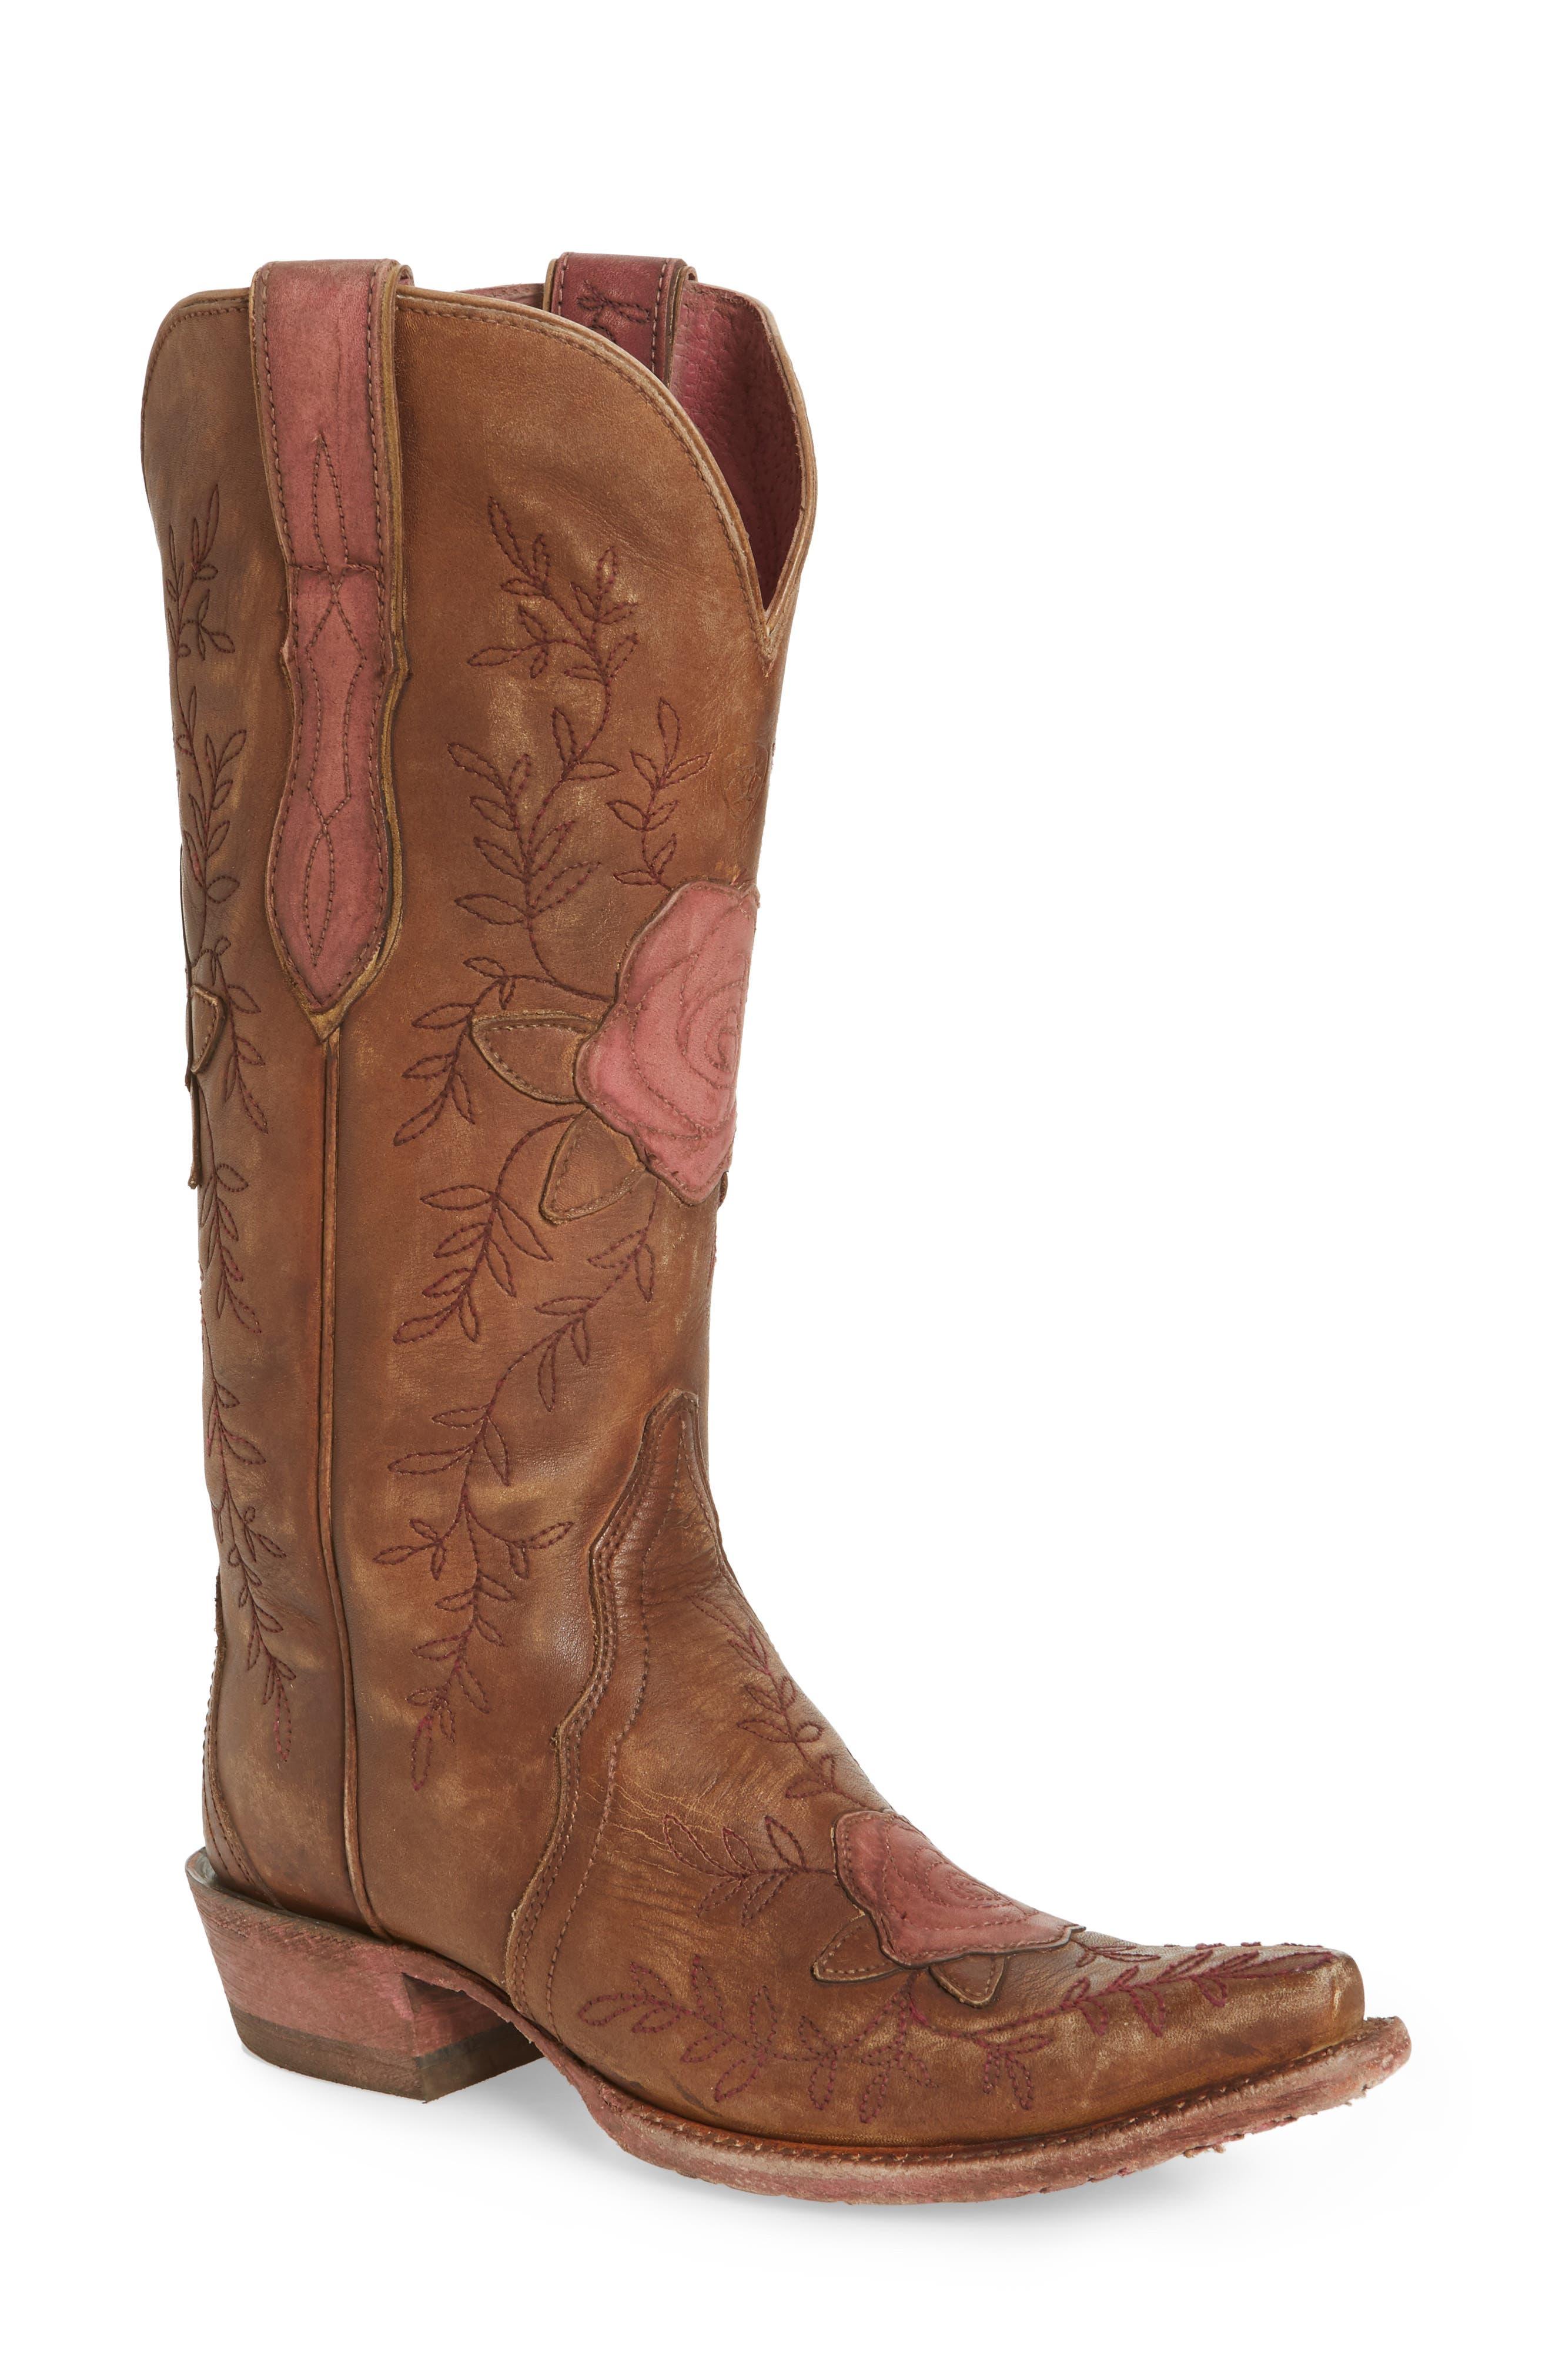 Ariat Rosalind Western Boot- Brown